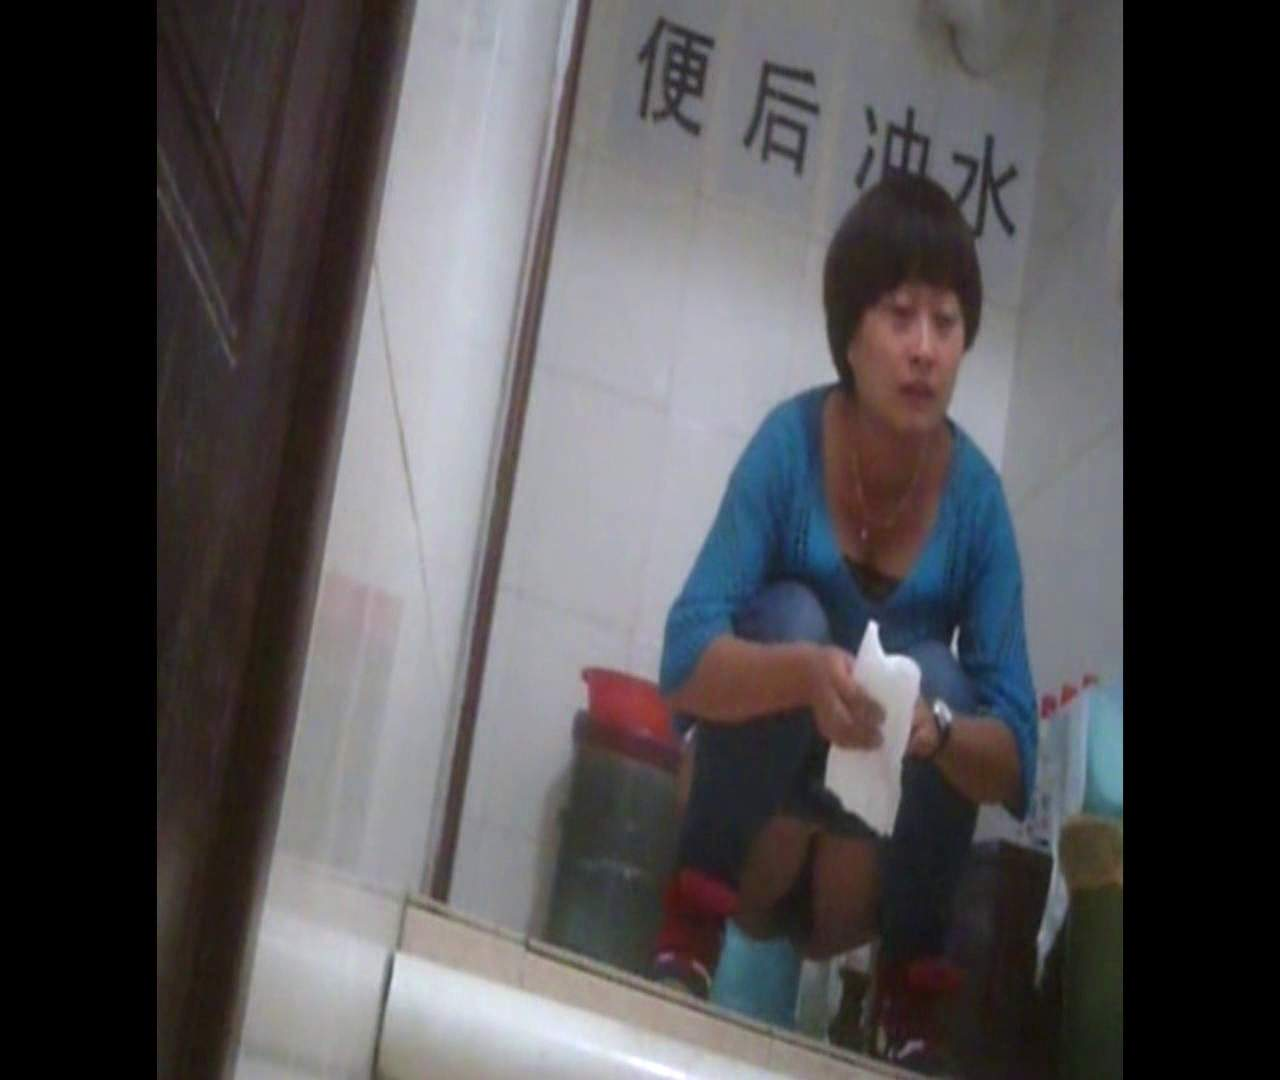 Vol.37 豊満な胸を持つマッシュルームカットな彼女 洗面所 | 丸見え  63画像 34